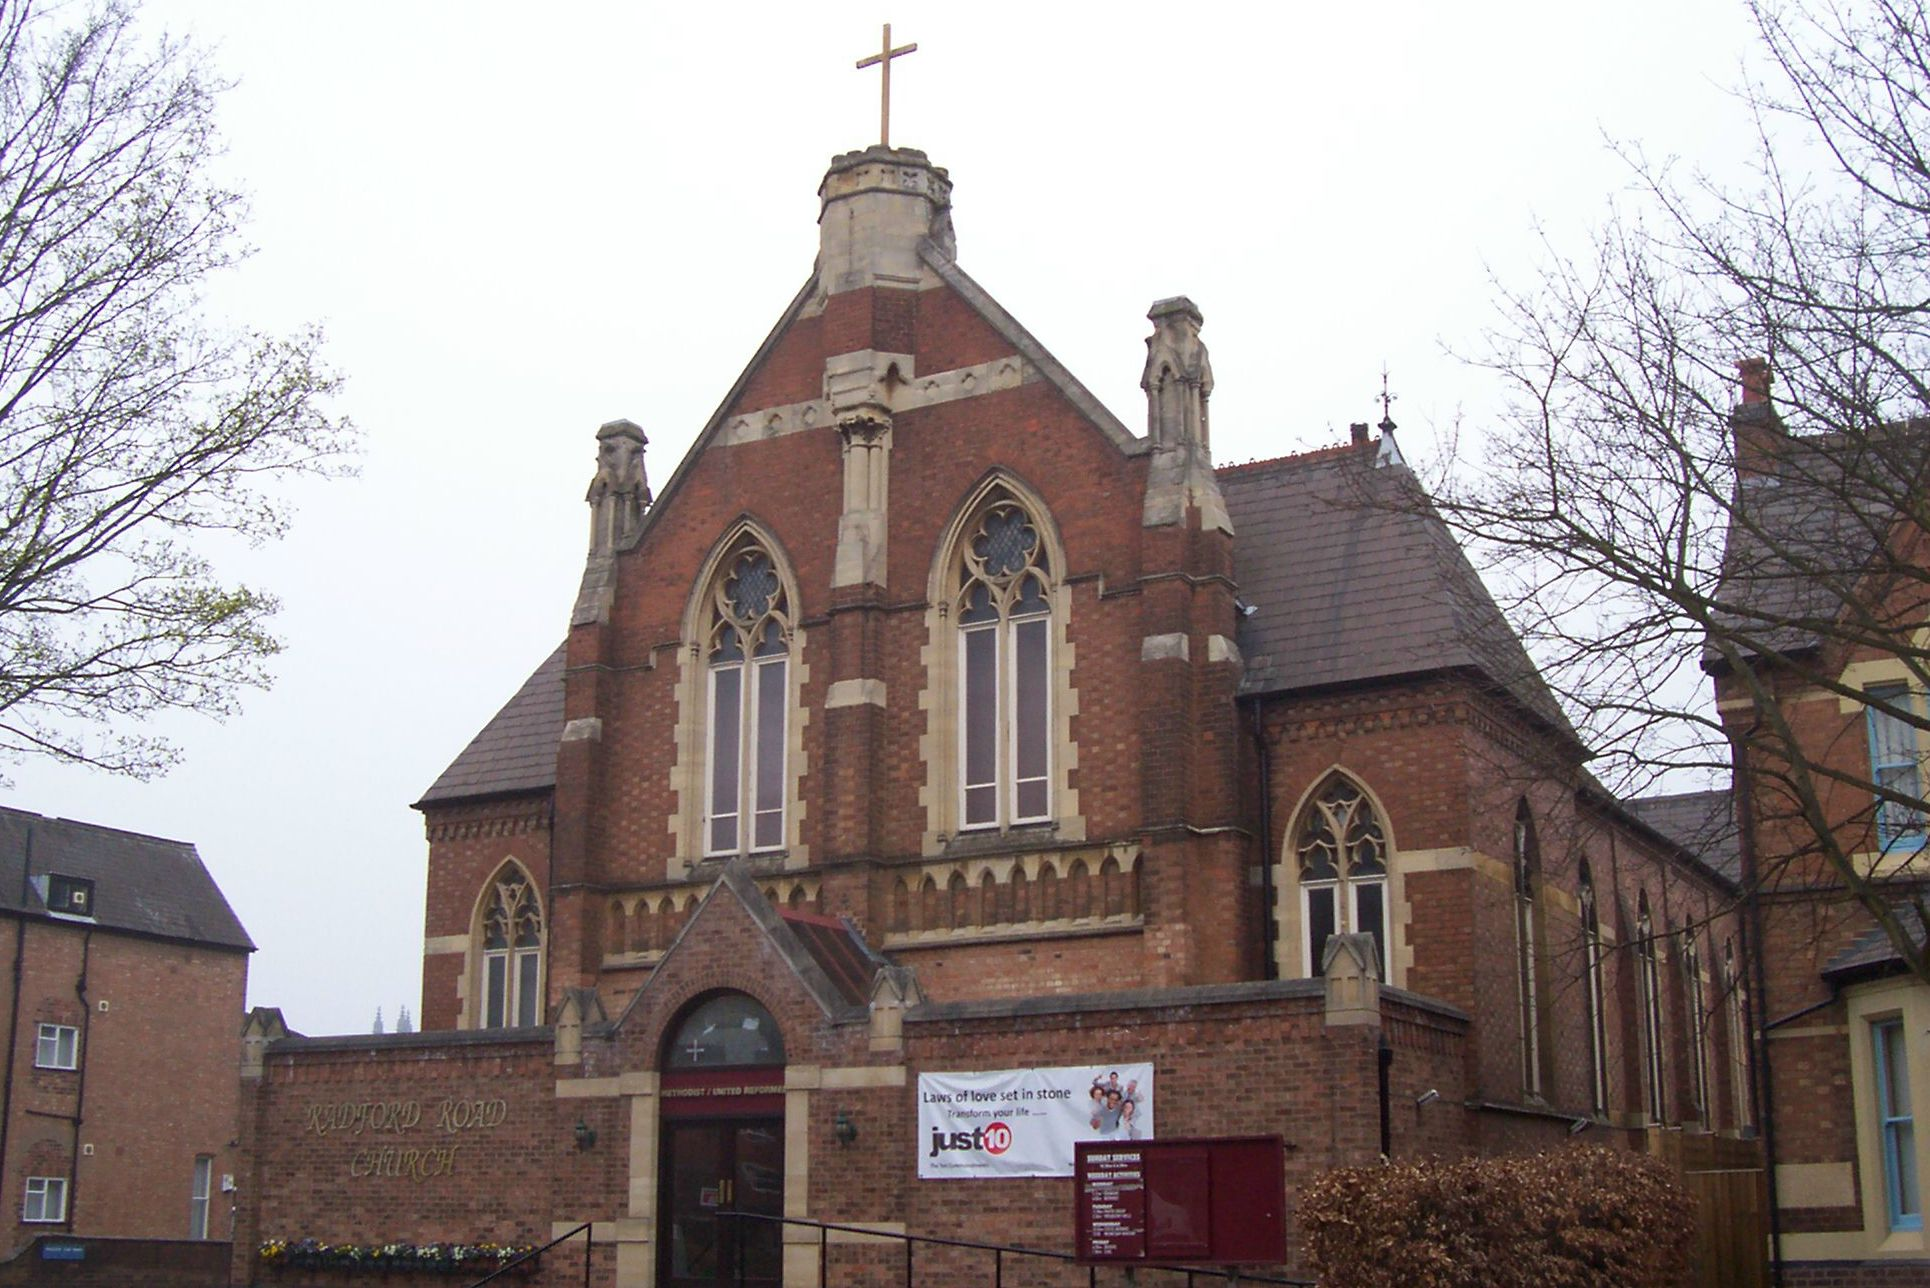 Radford Road Methodist Church